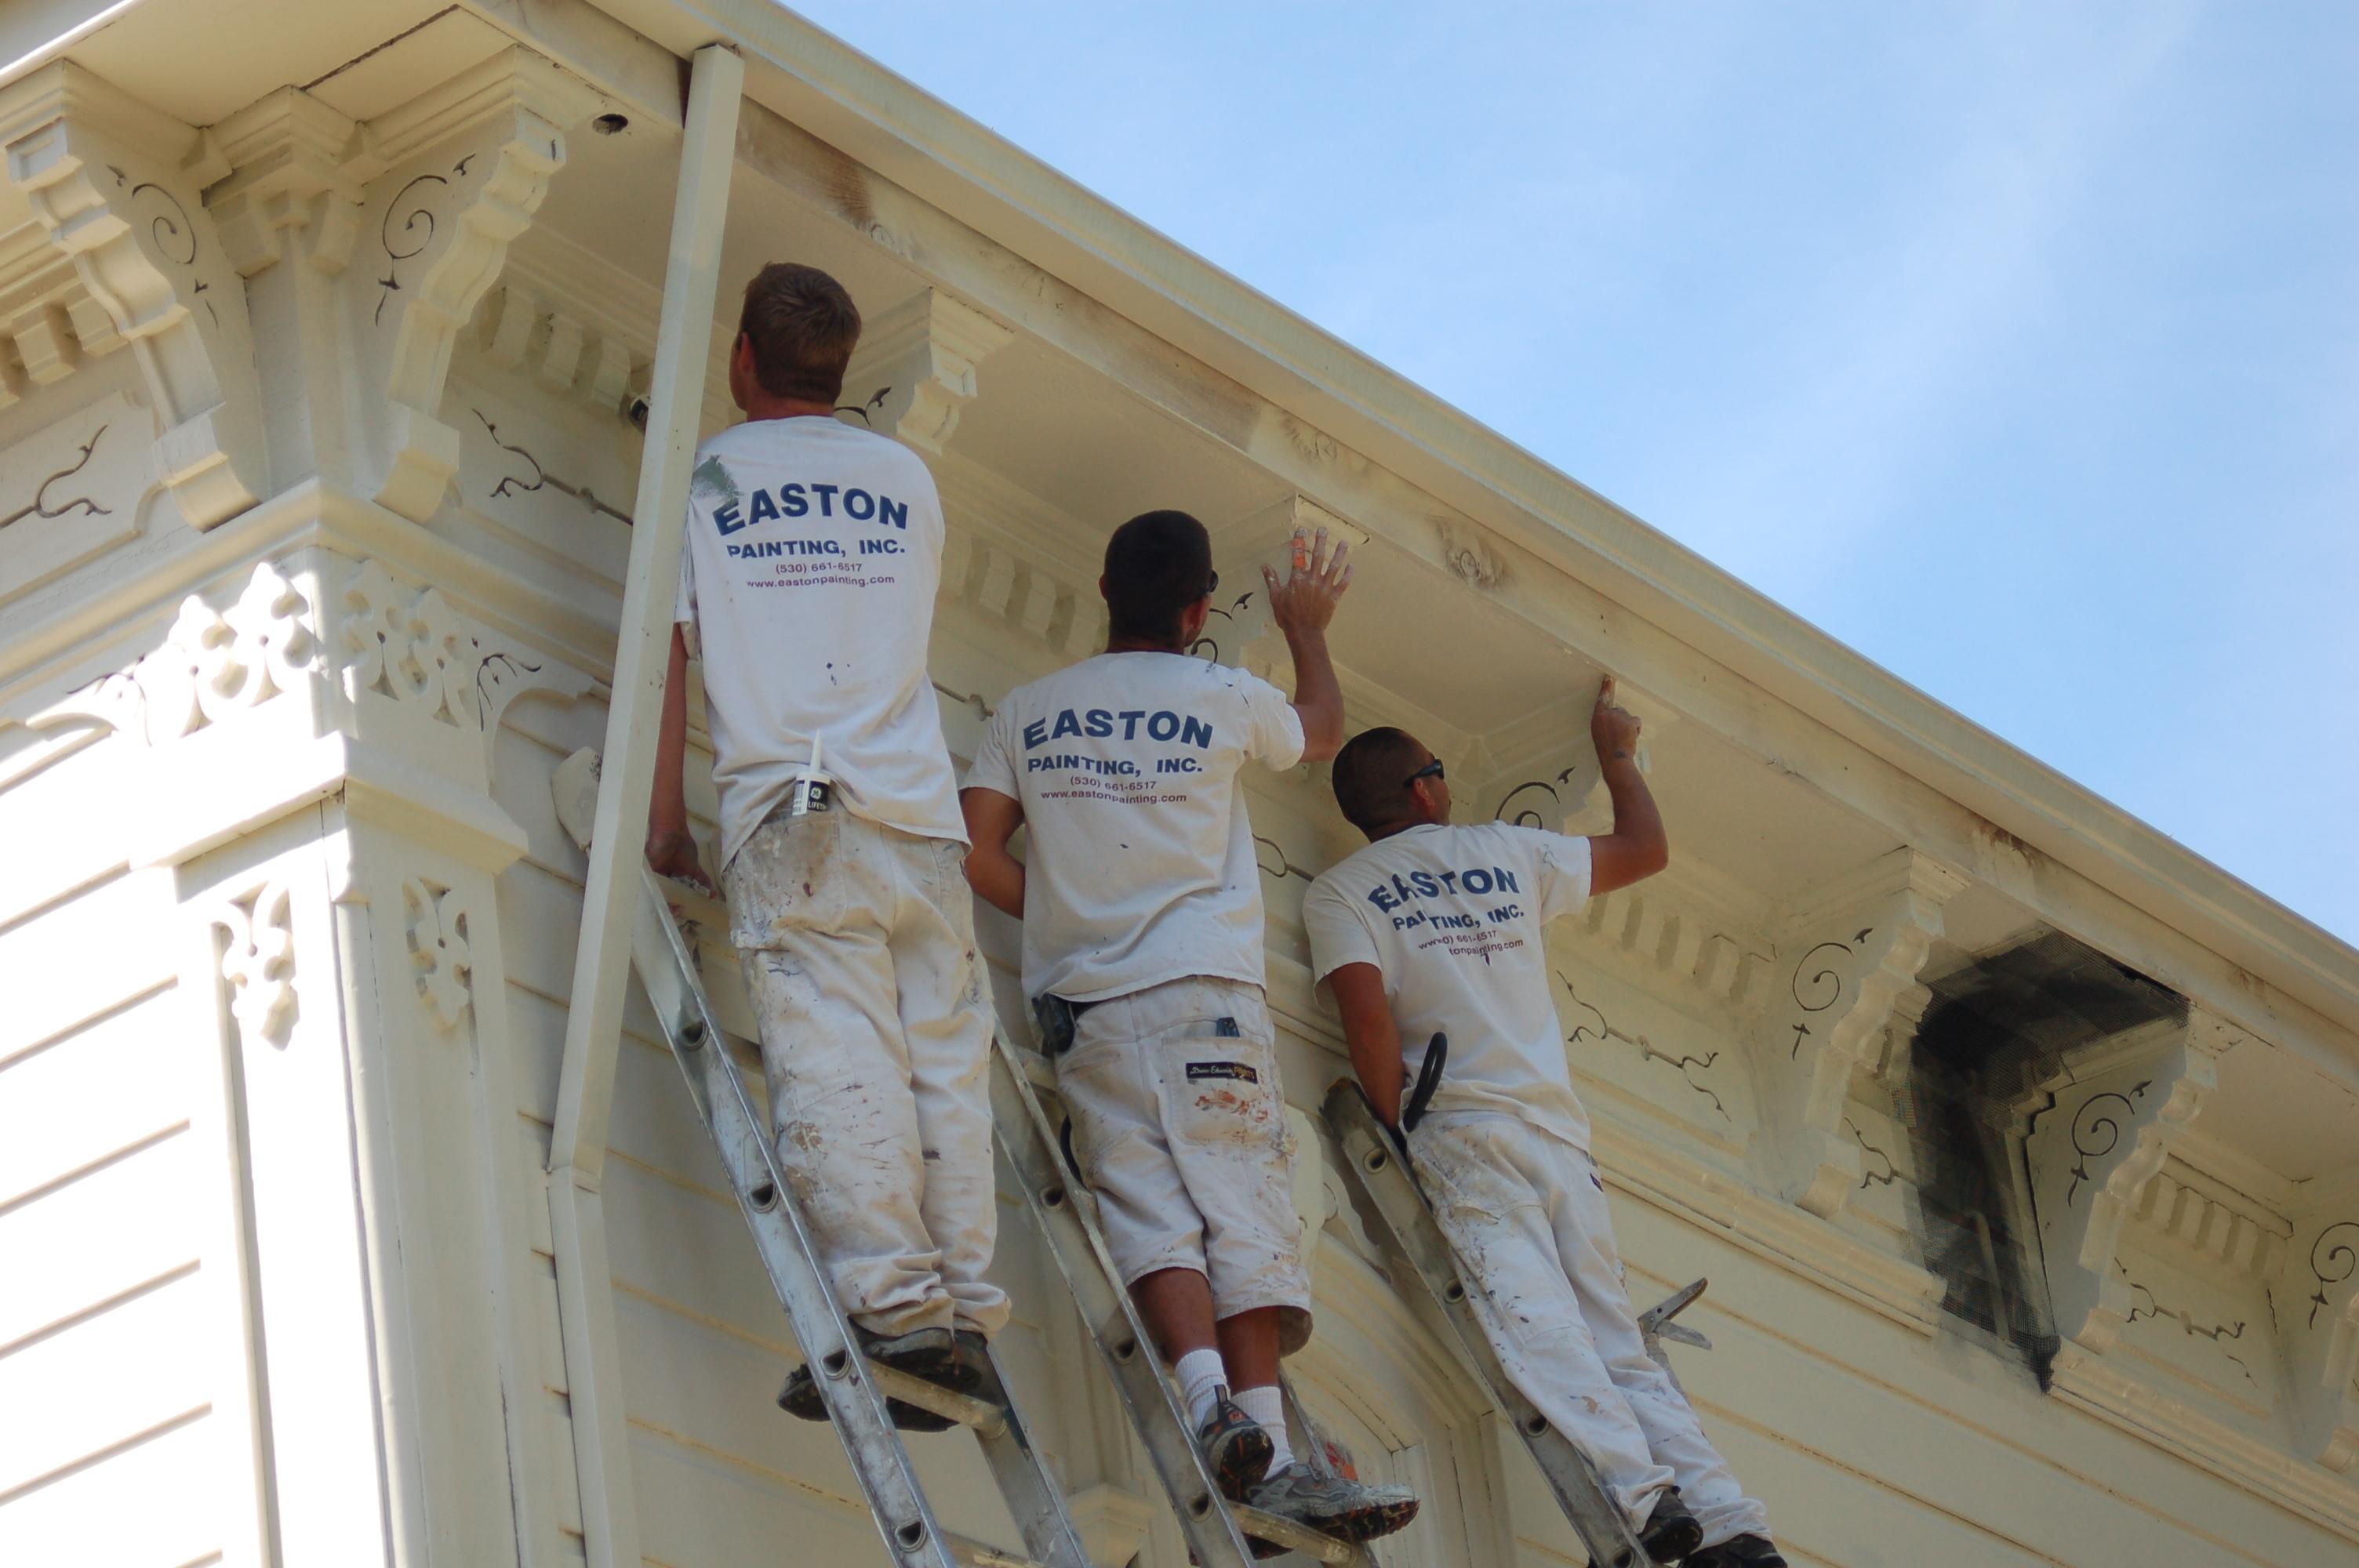 Easton Painters